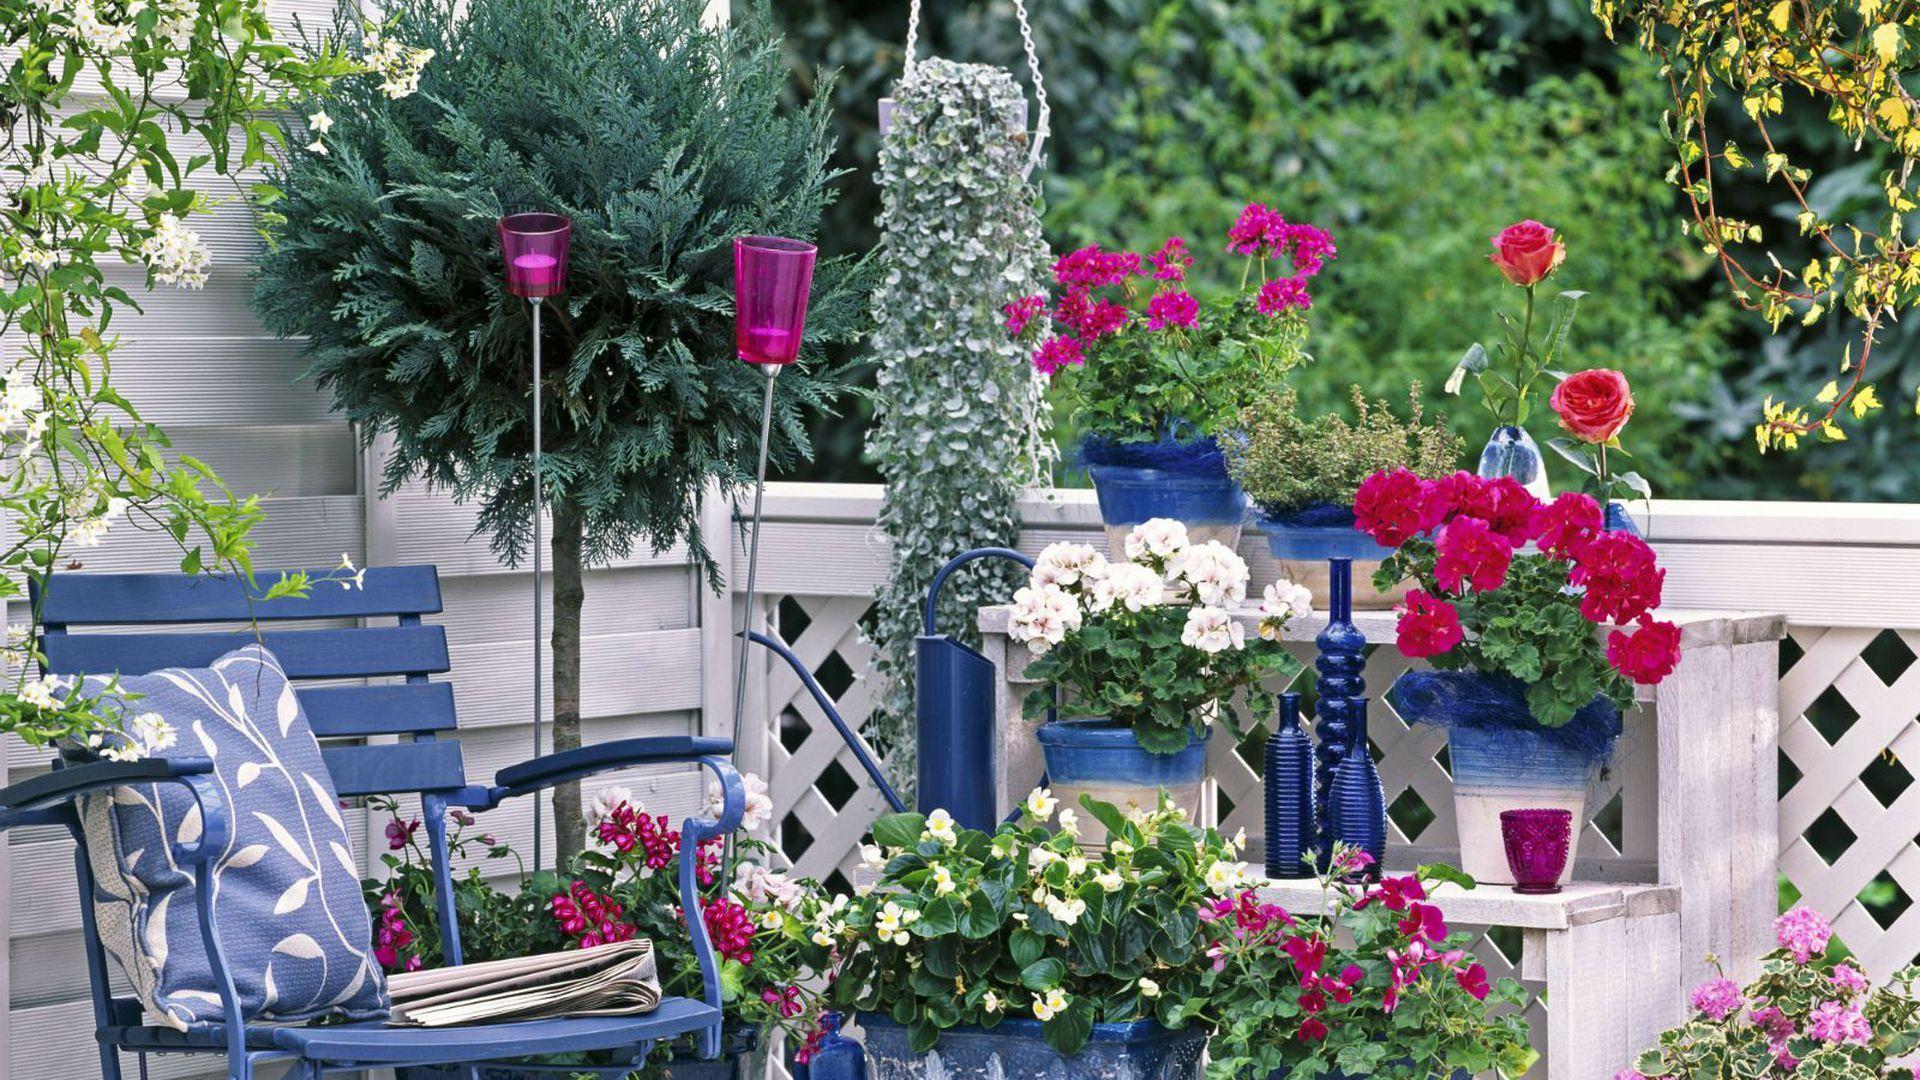 Slikovni Rezultat Za Cvijece Za Balkon Na Suncu Beautiful Flowers Garden Beautiful Gardens Plants